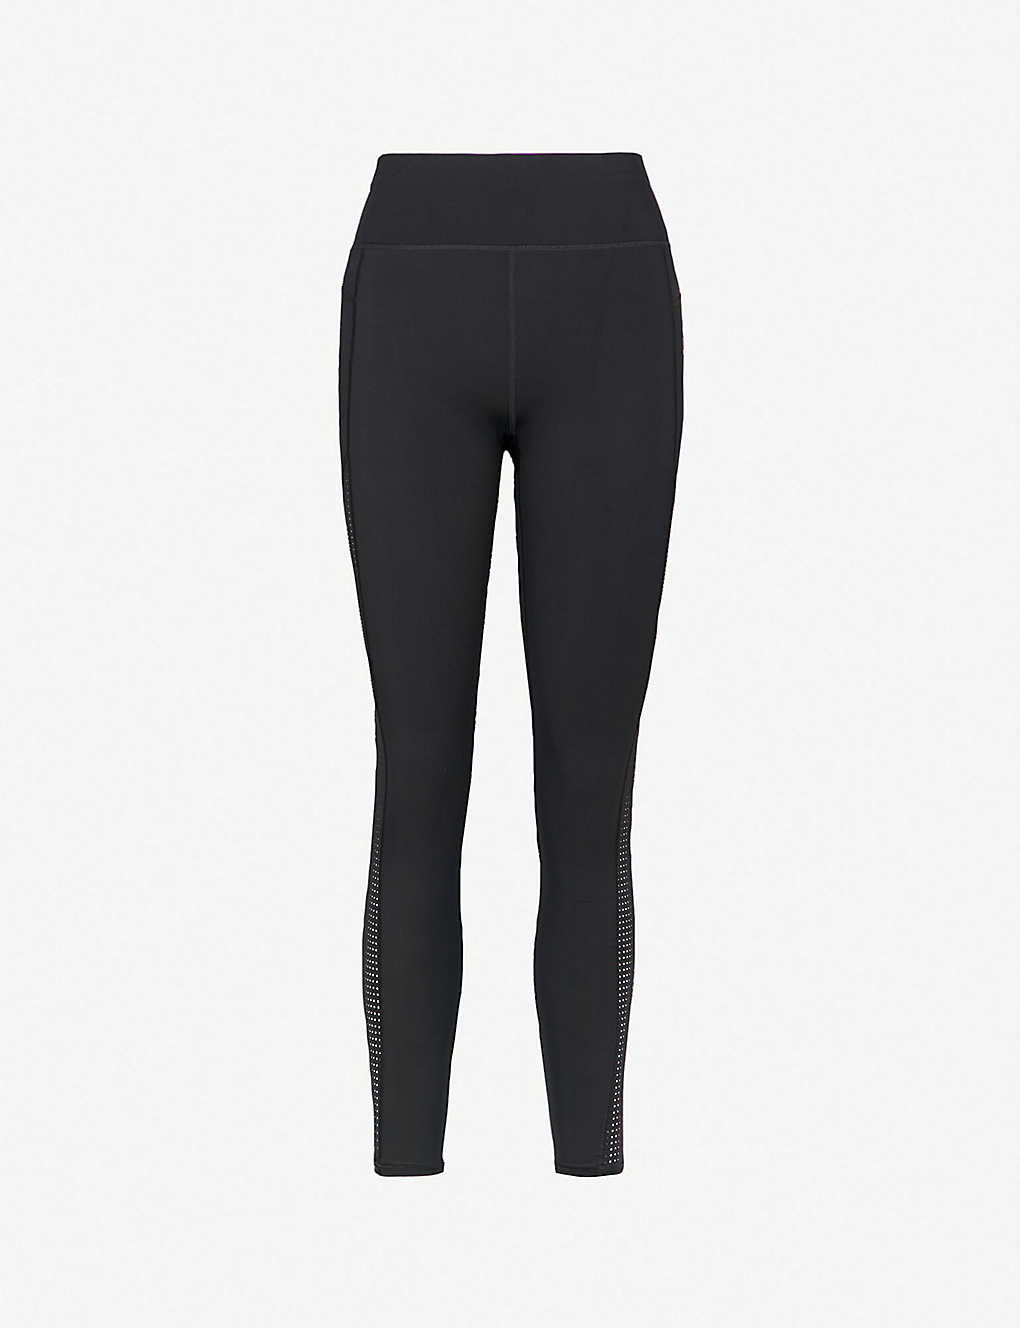 8974370cf0e861 SWEATY BETTY - Zero Gravity Run jersey leggings   Selfridges.com